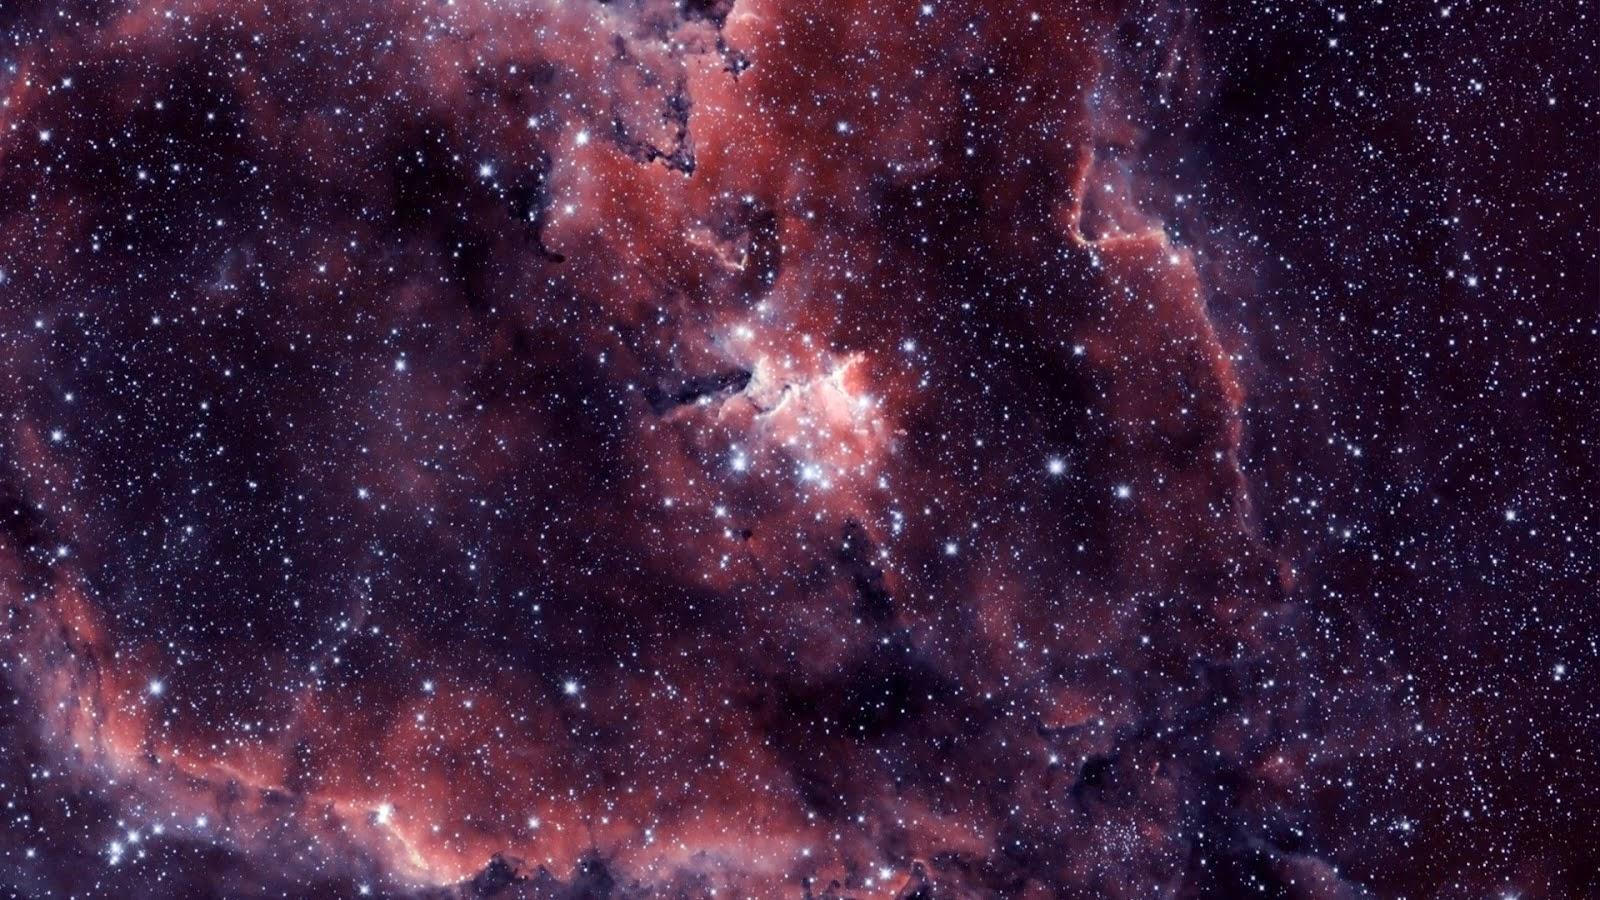 Colorful Galaxy Wallpapers Hd Universe Wallpaper Hd 1080p 1600x900 Wallpaper Teahub Io